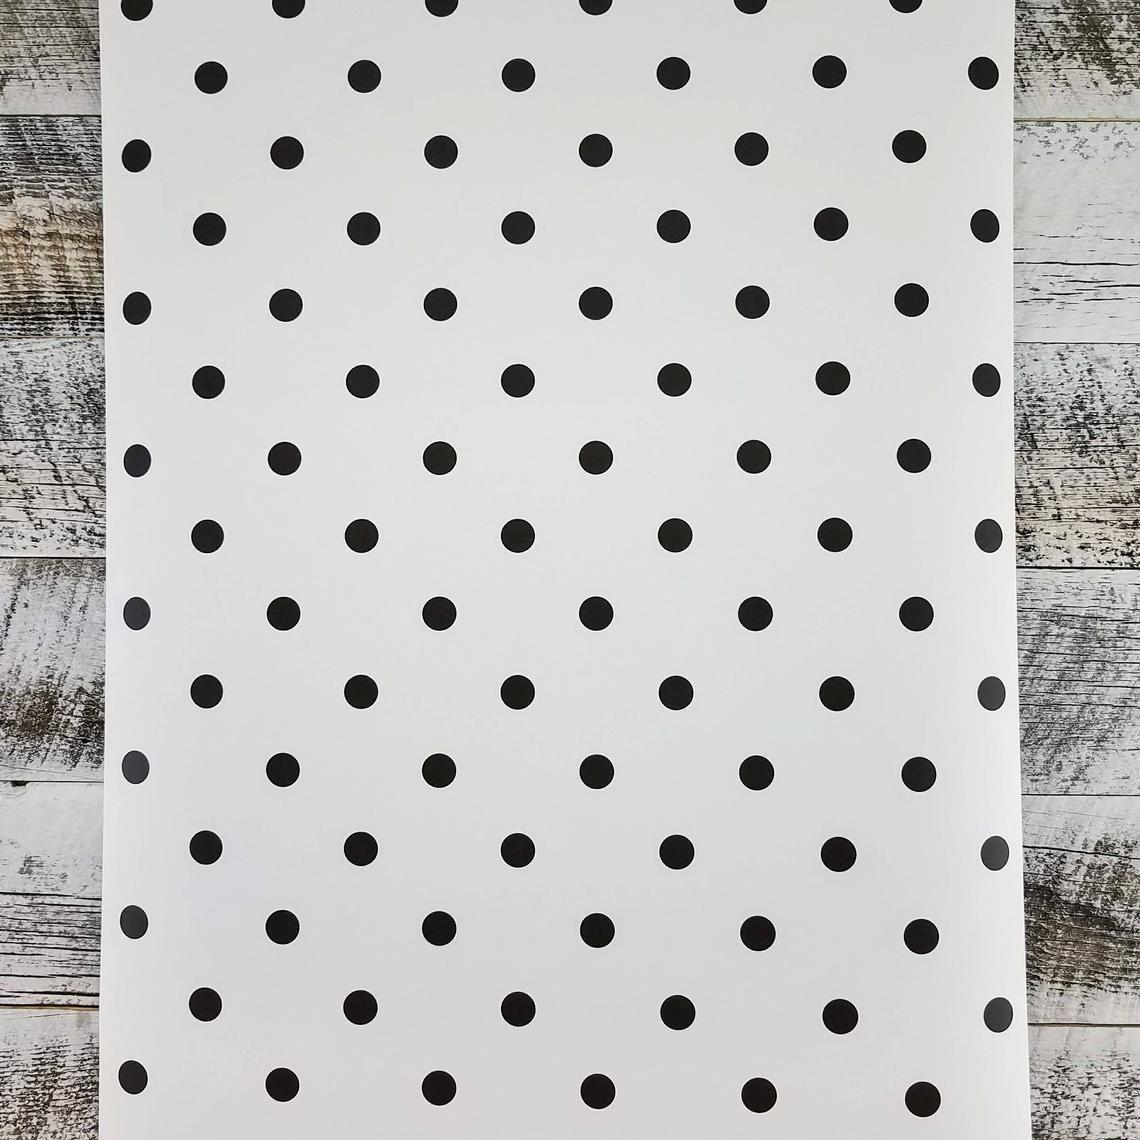 York Magnolia Home Joanna Gaines White Black Polka Dot